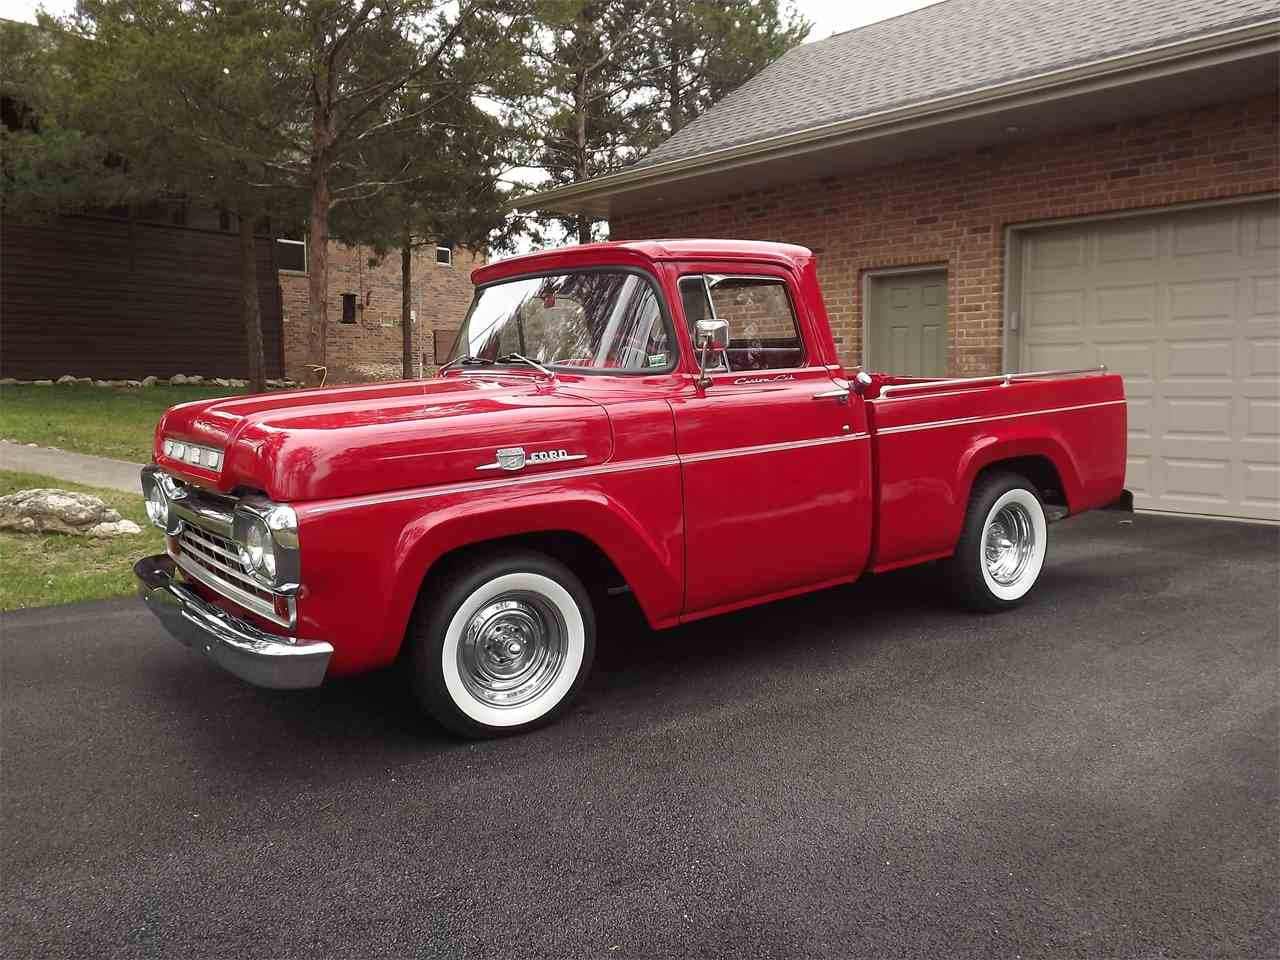 Trucks For Sale In Missouri >> 1960 Ford F100 for Sale | ClassicCars.com | CC-967371